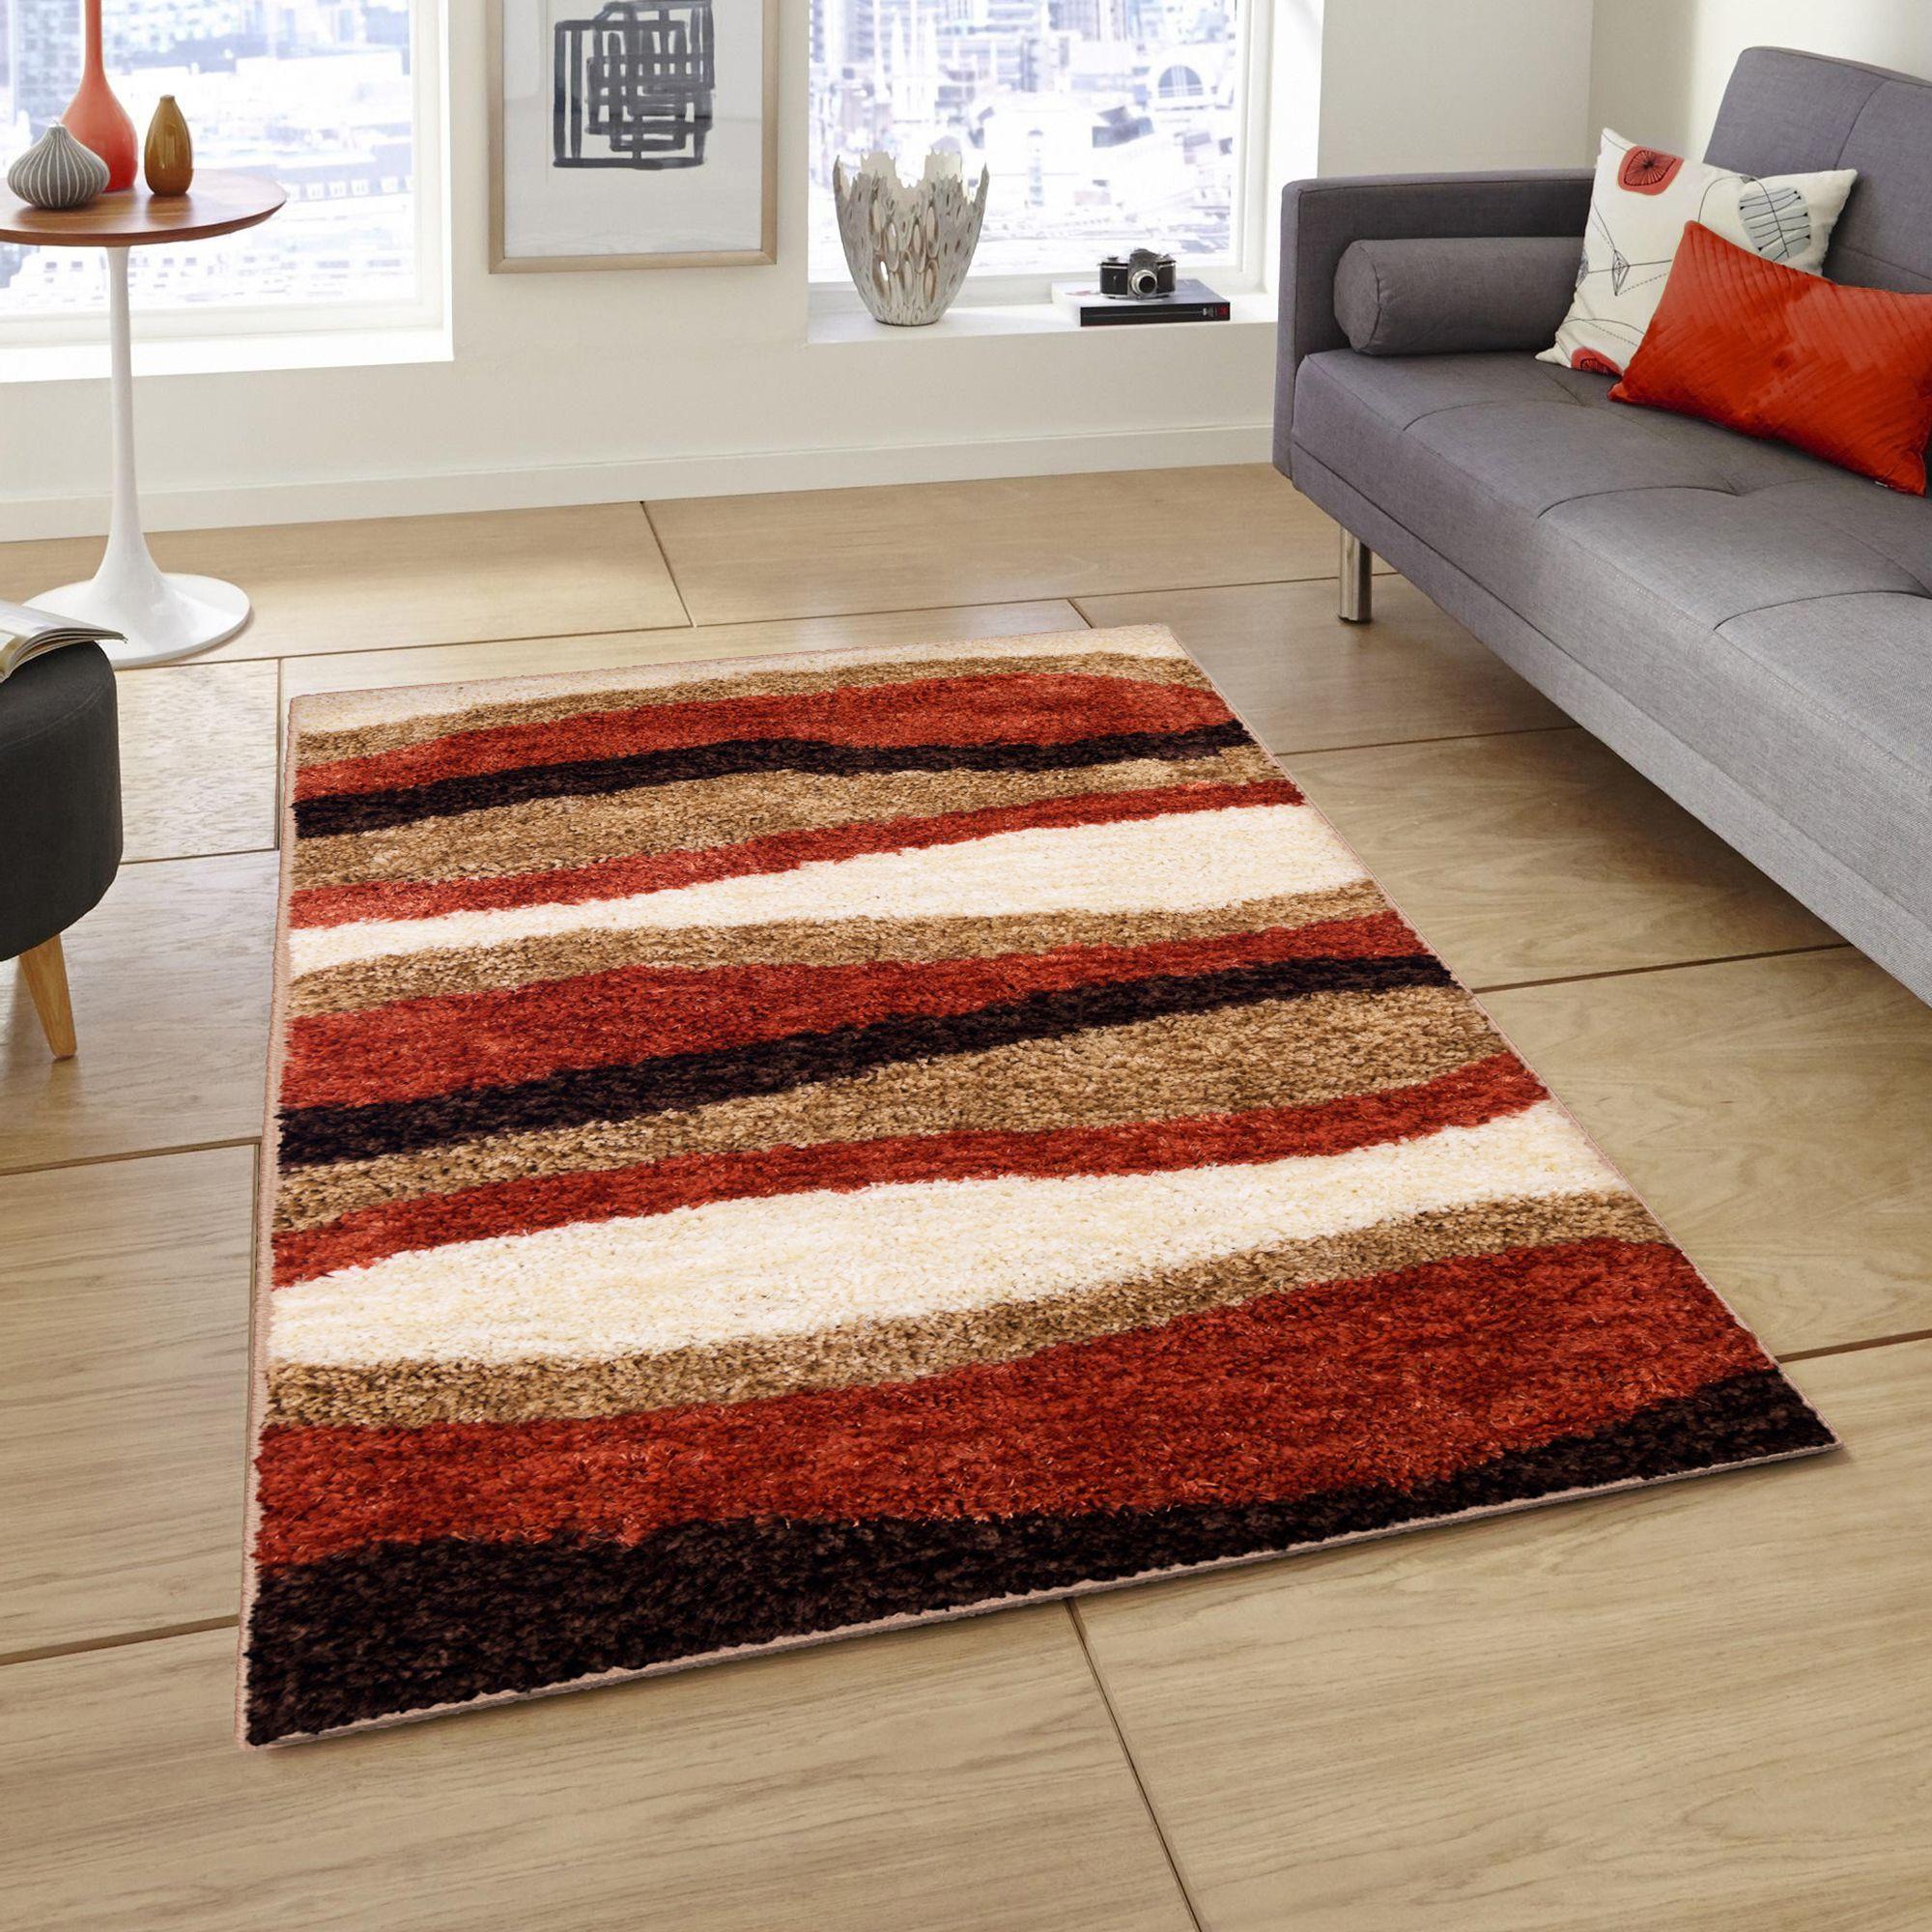 Story@Home Multi Polyester Carpet Geometrical 3x5 Ft.